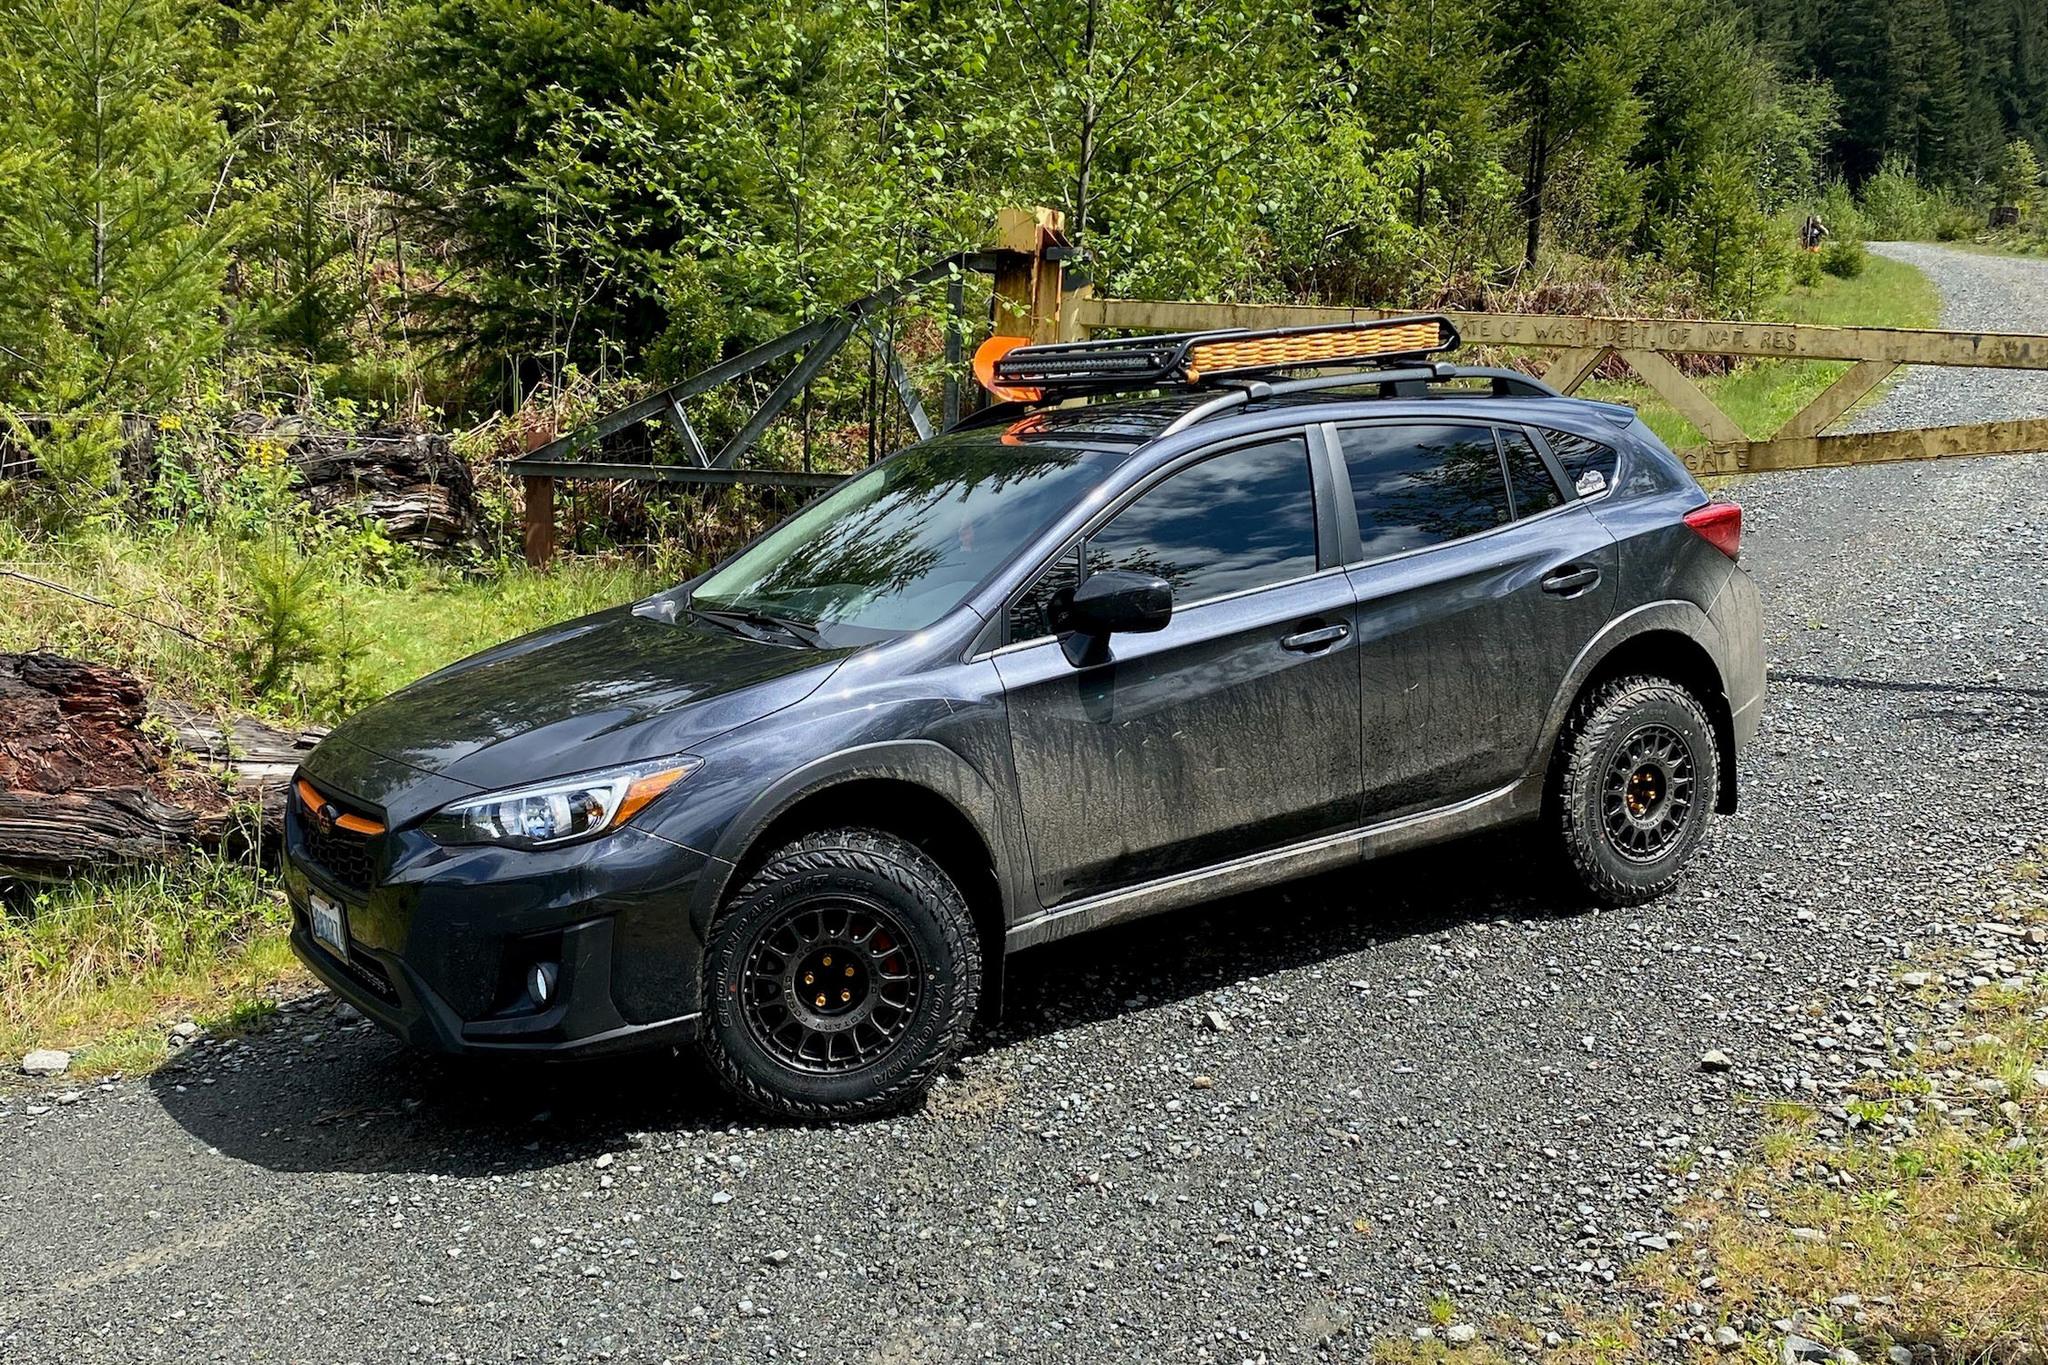 Black Rhino Sandstorm forged wheels